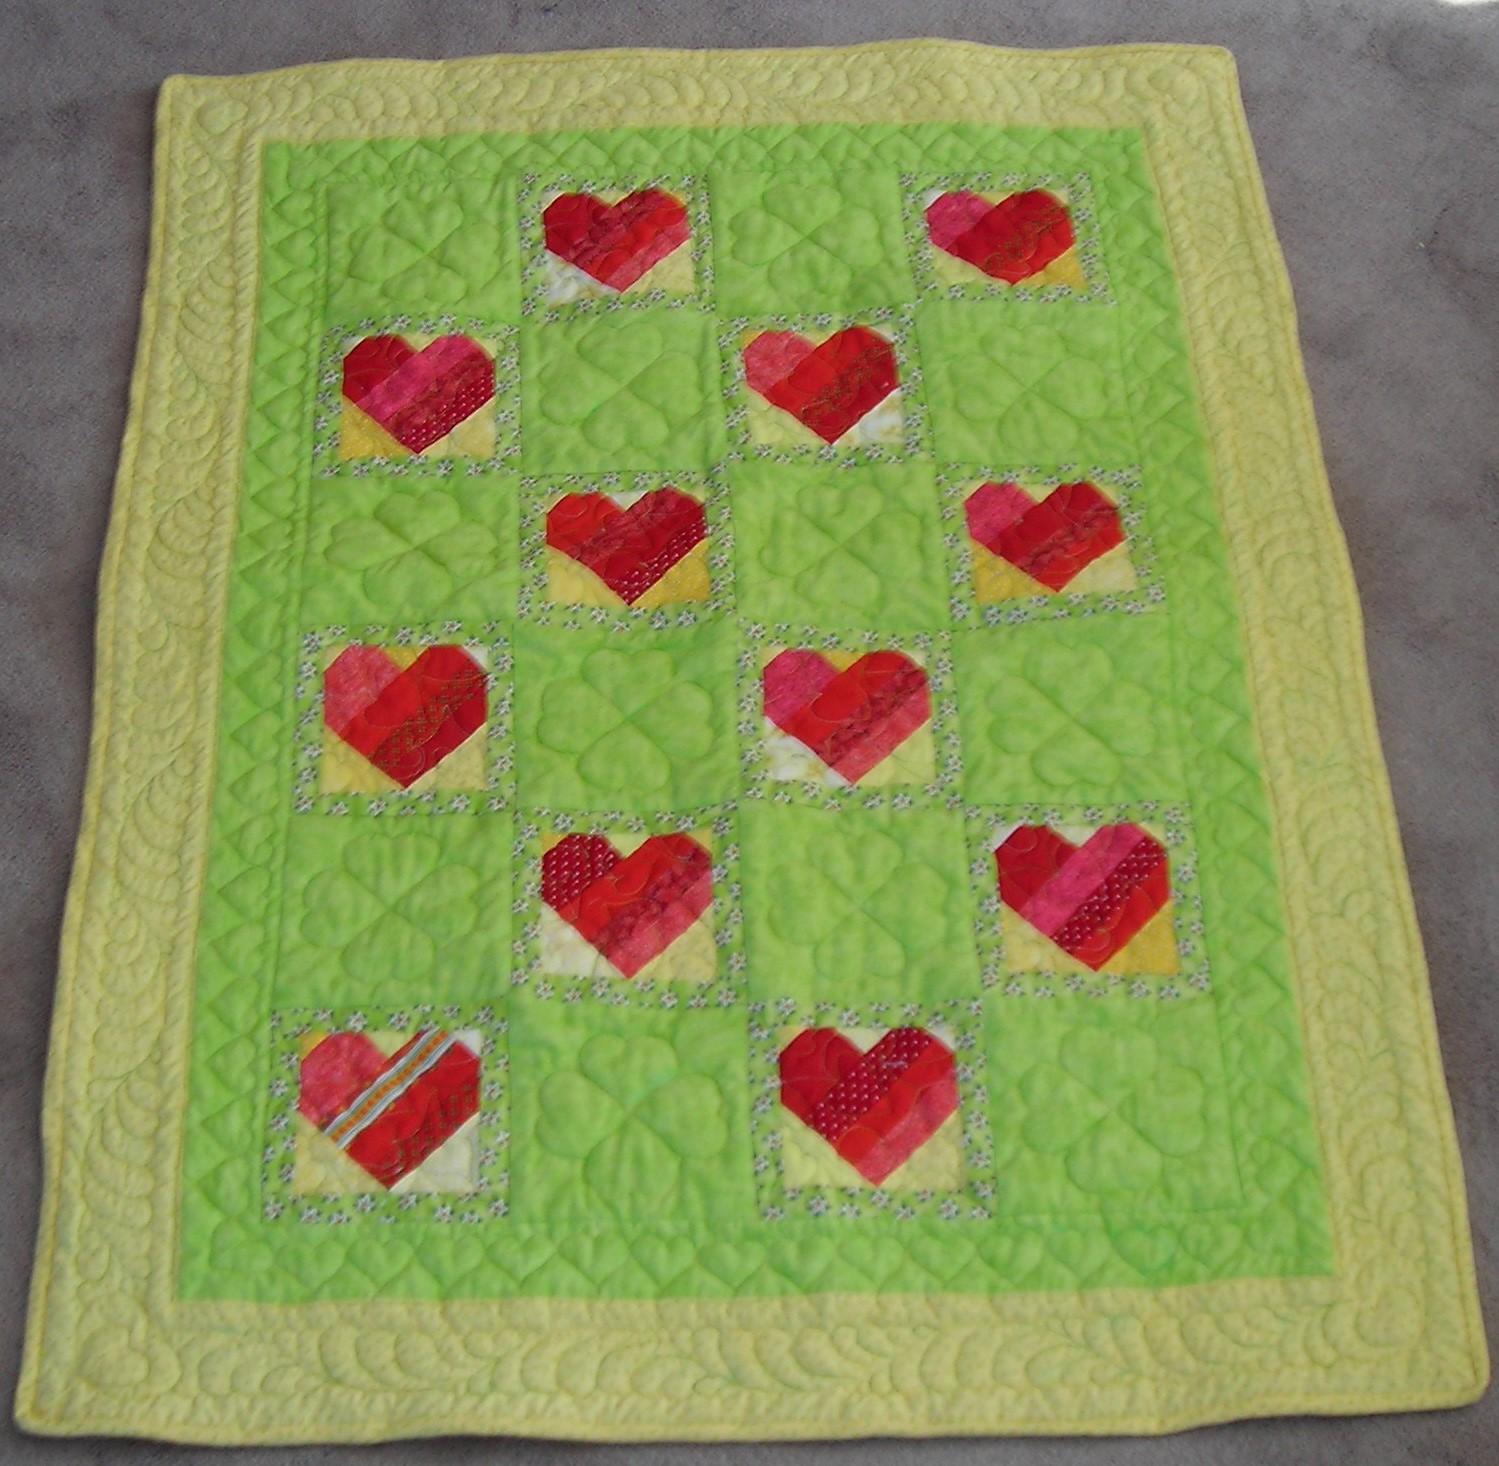 Carol Johnson - Hearts Mini Quilt